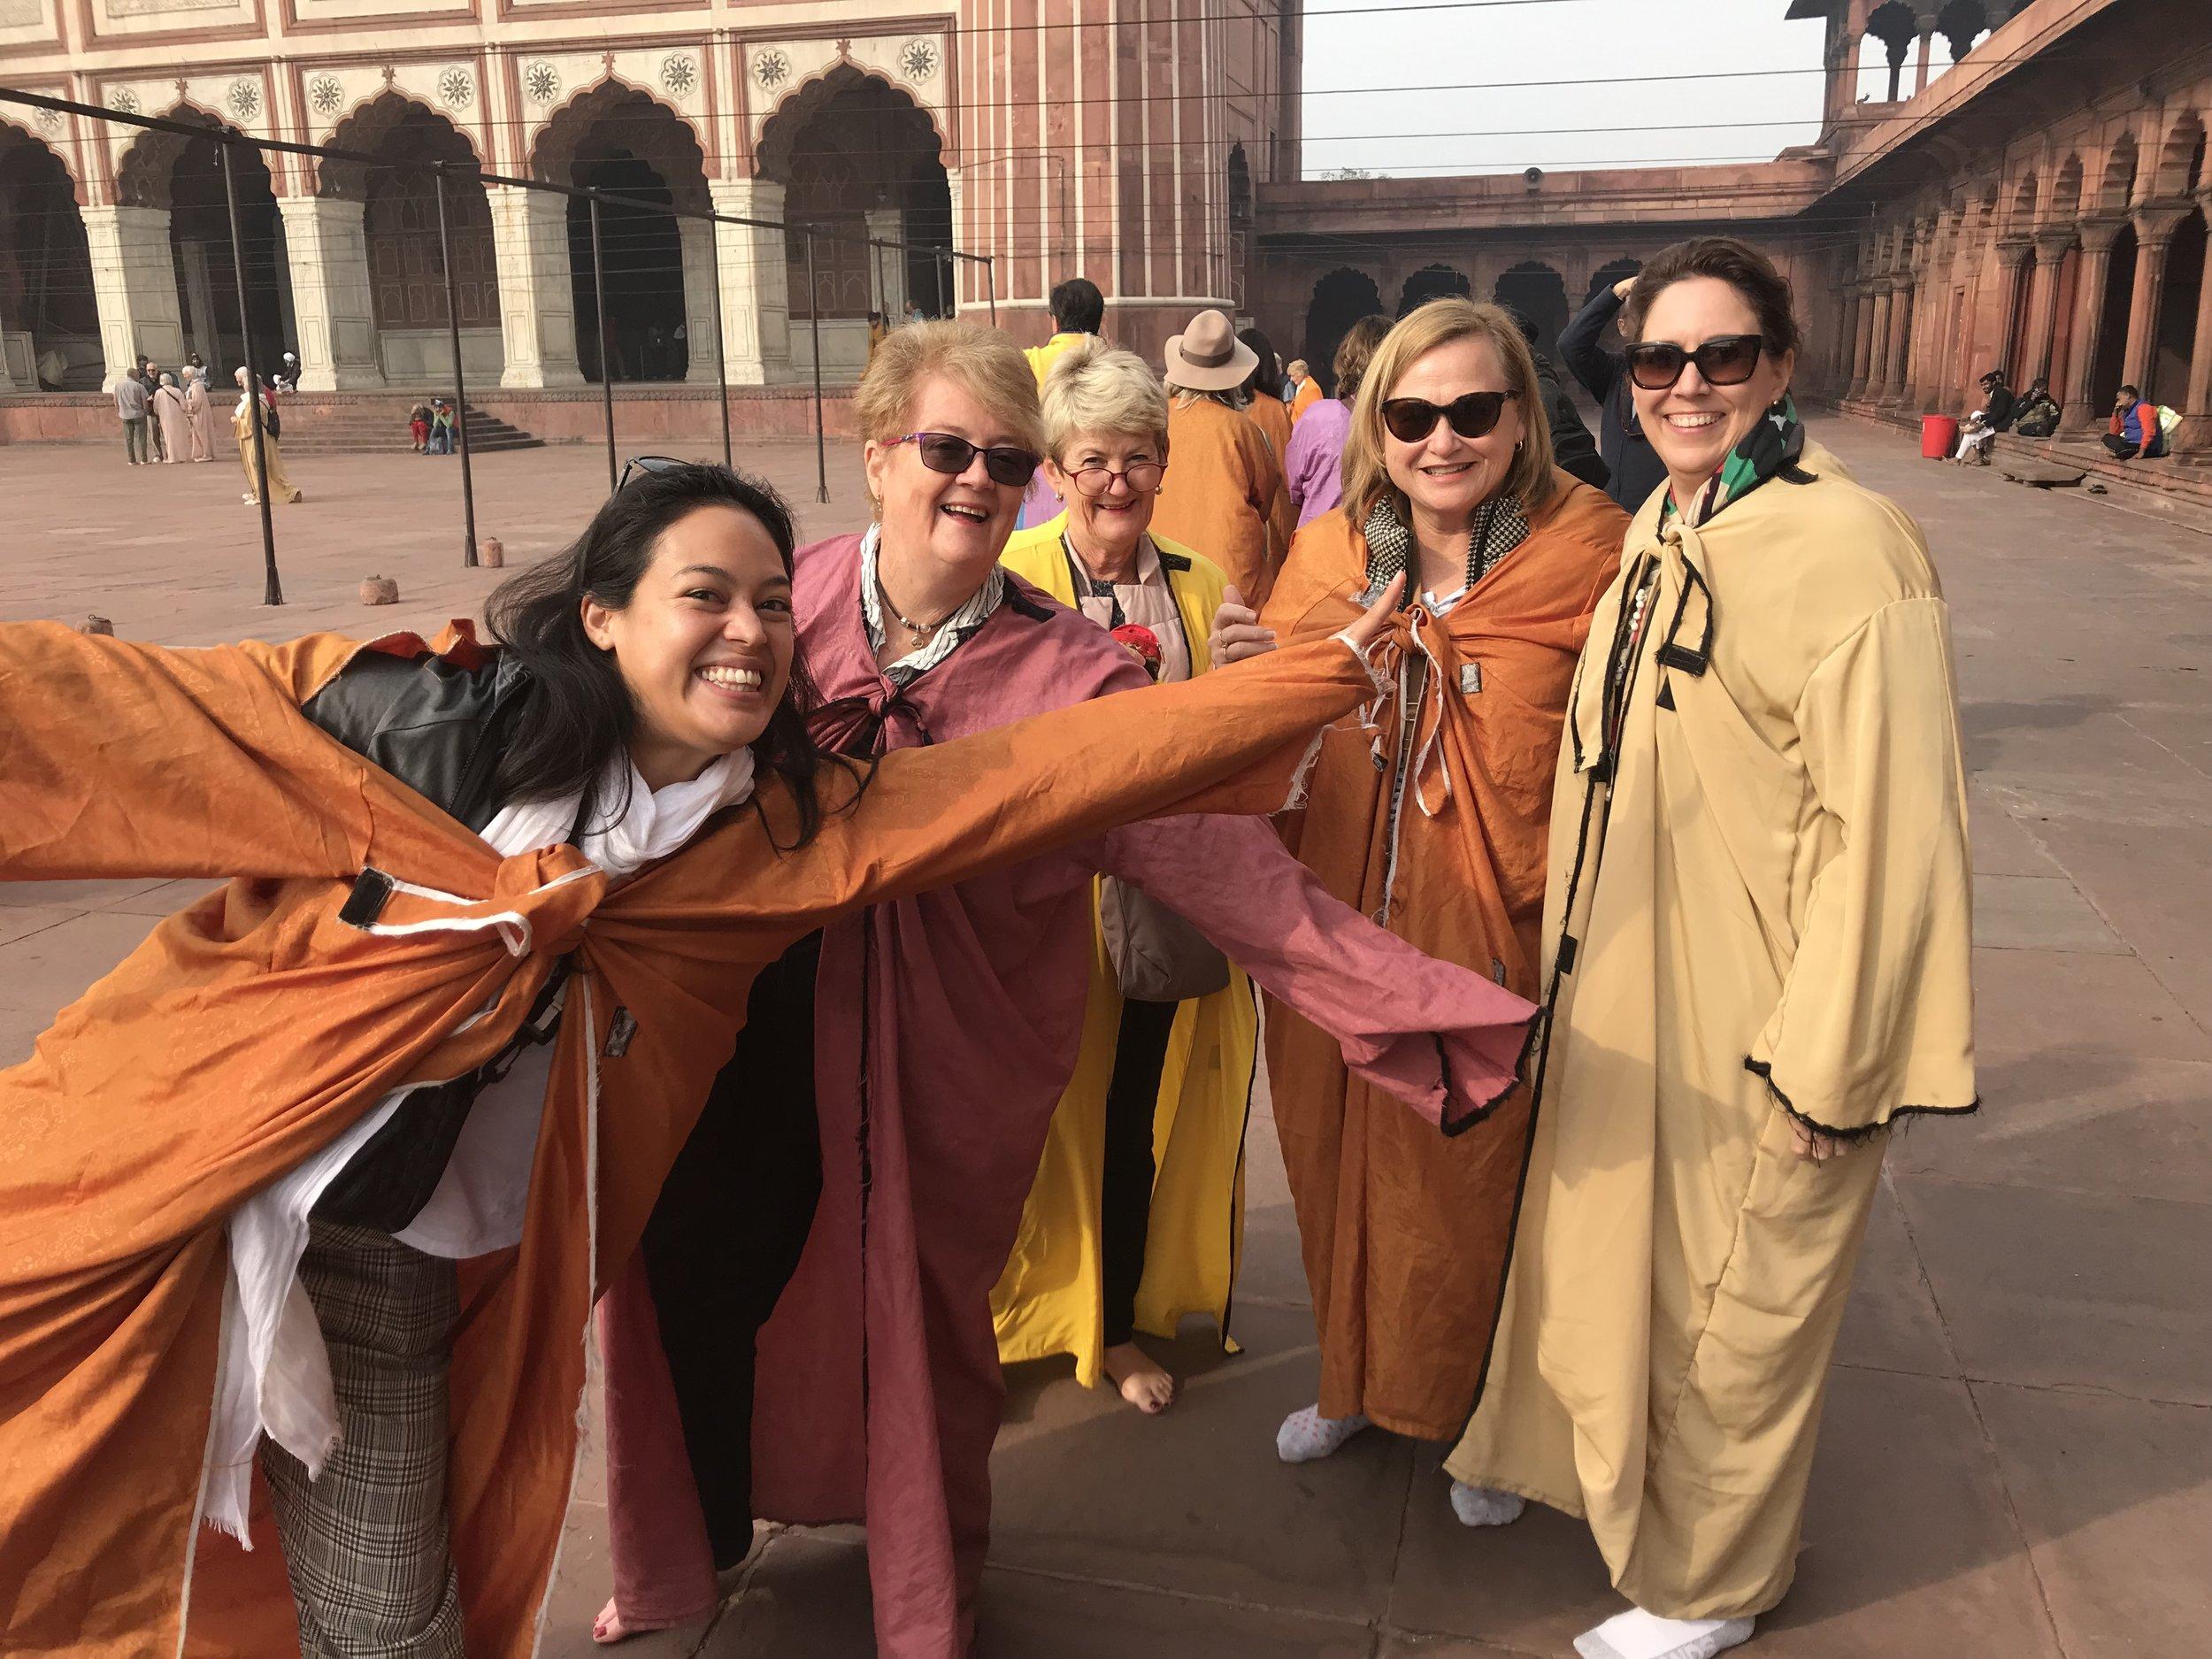 Raj girls in robes.jpg